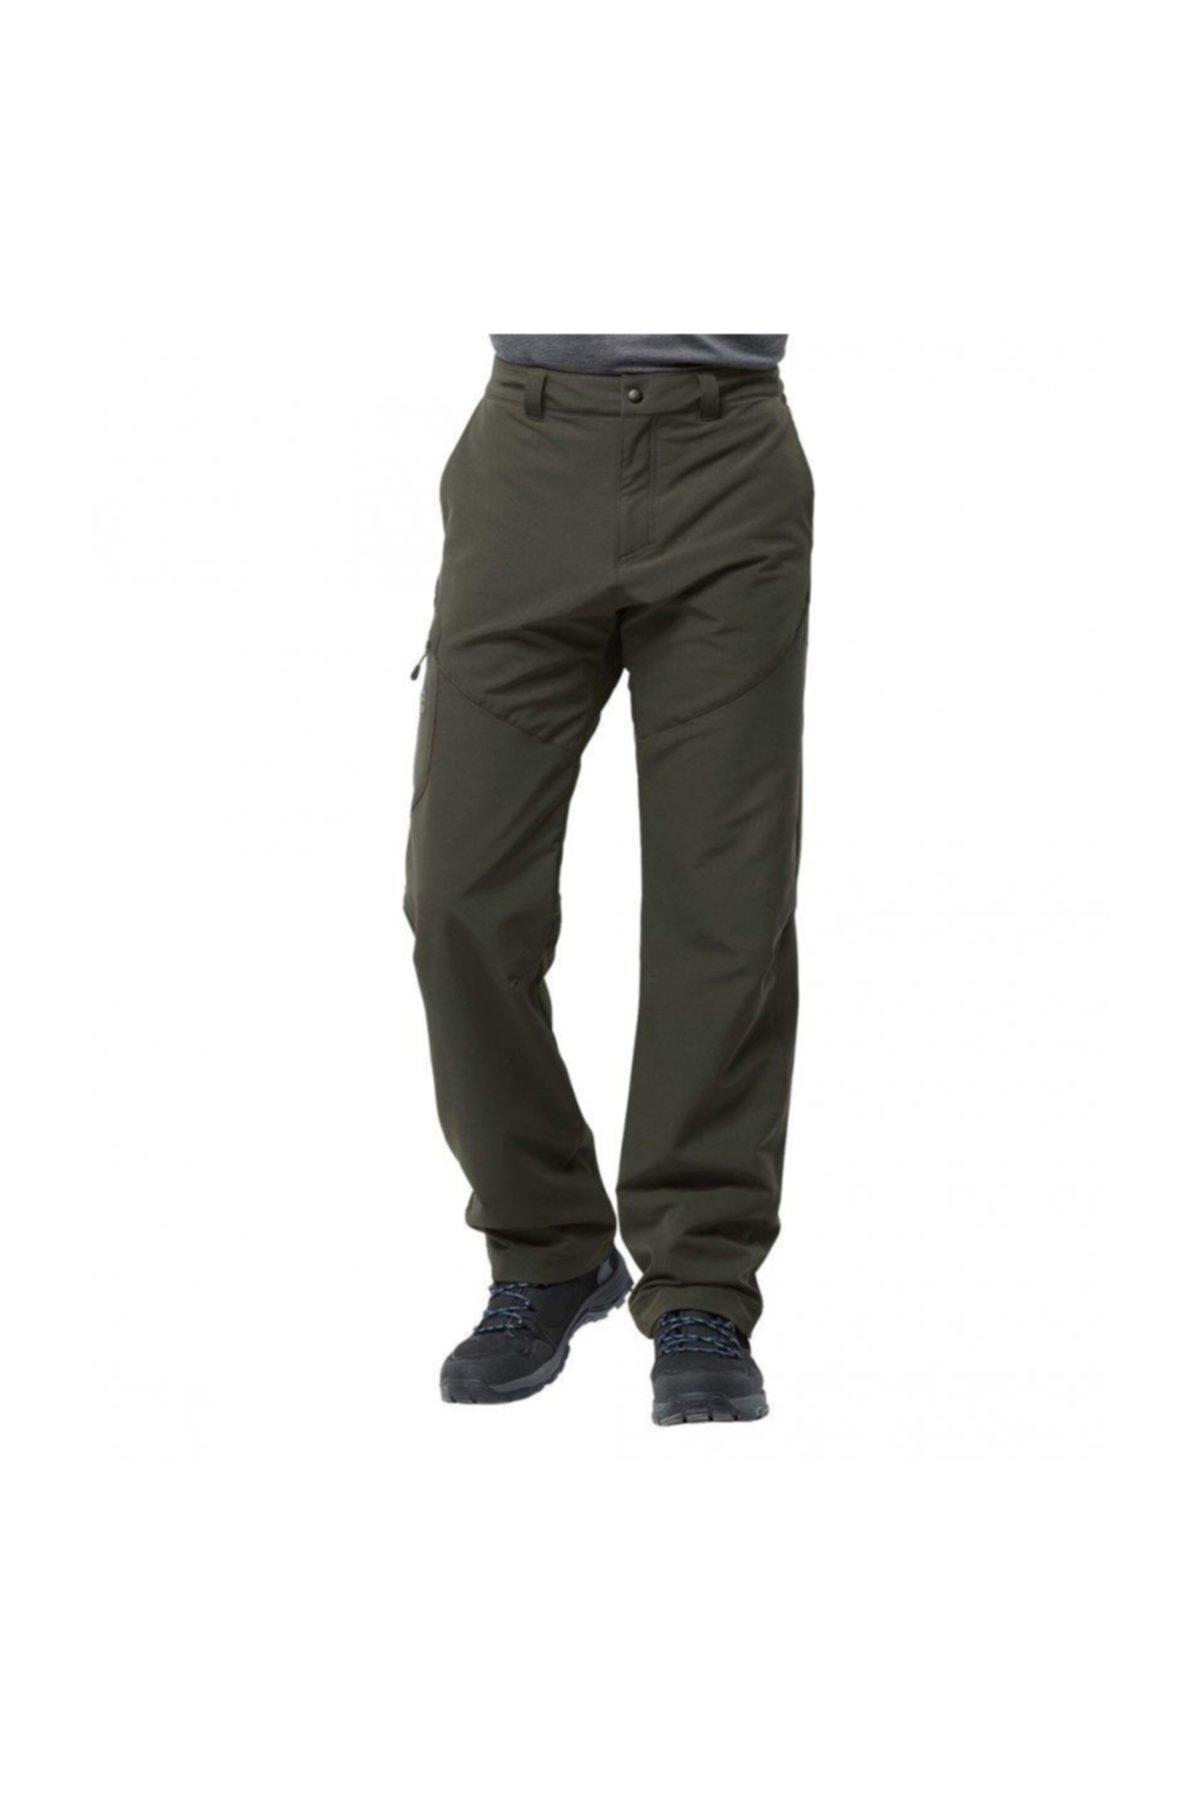 Jack Wolfskin Chilly Track XT Erkek Pantolon - 1502381-5100 2